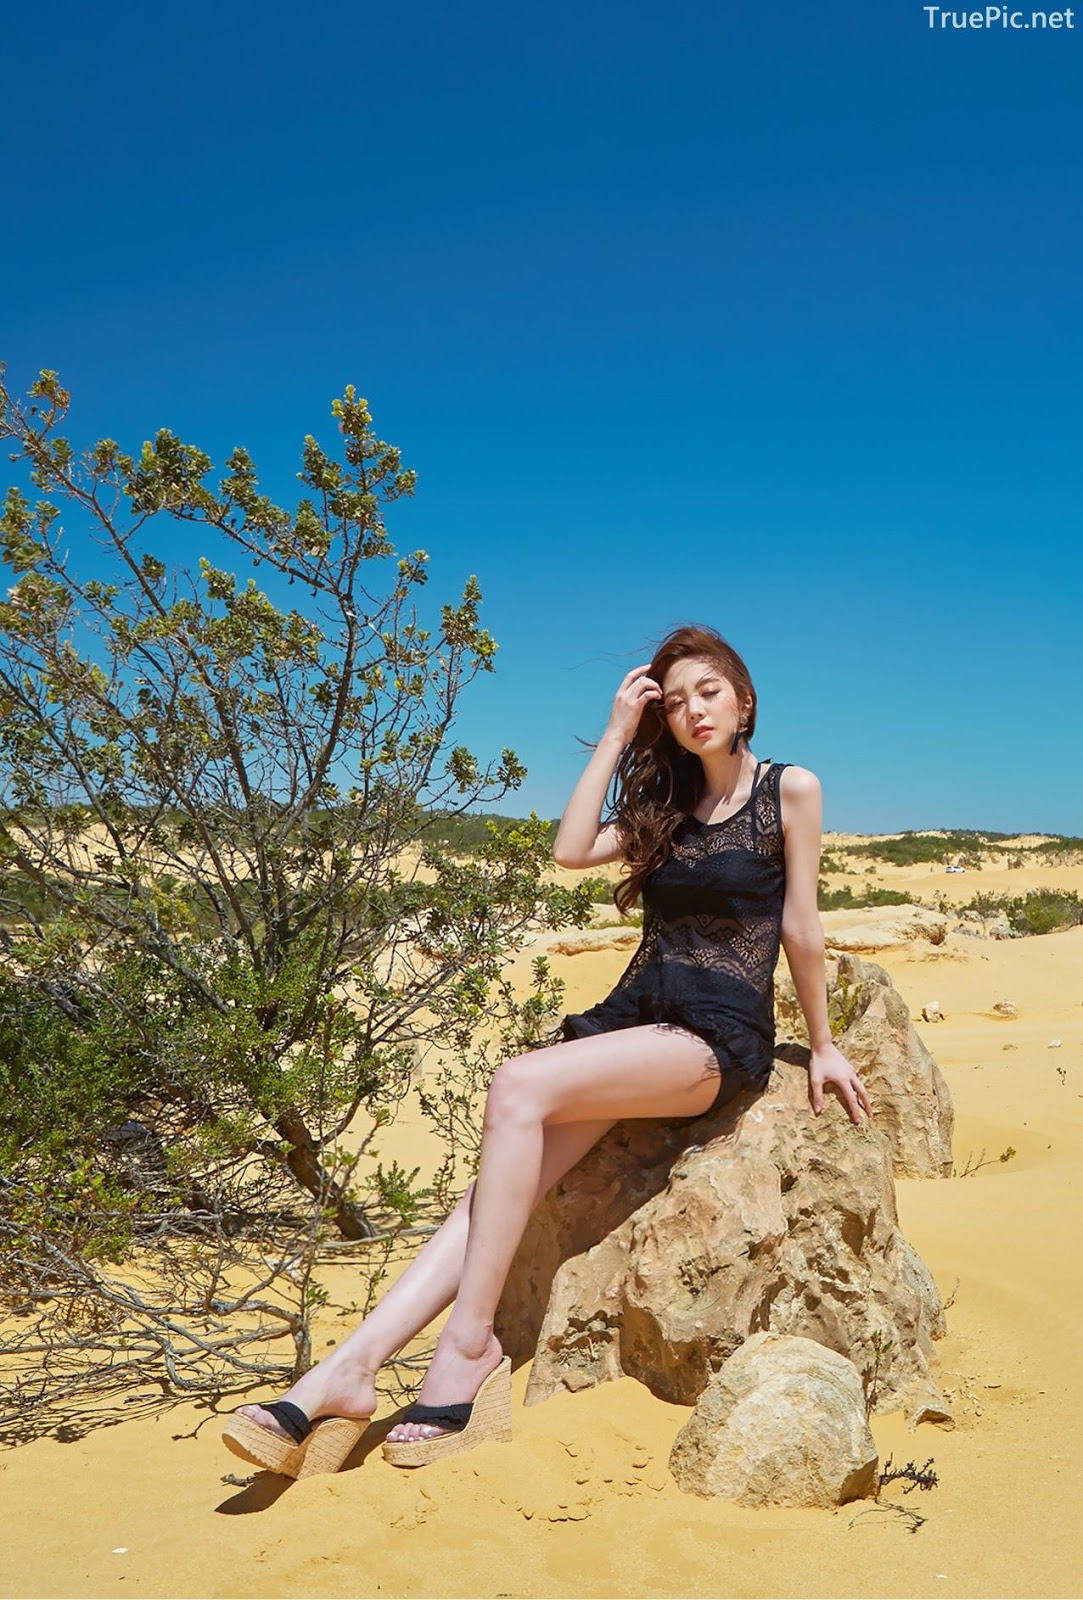 Korean fashion model Lee Chae Eun - Siena Beachwear Set Collection - TruePic.net - Picture 8